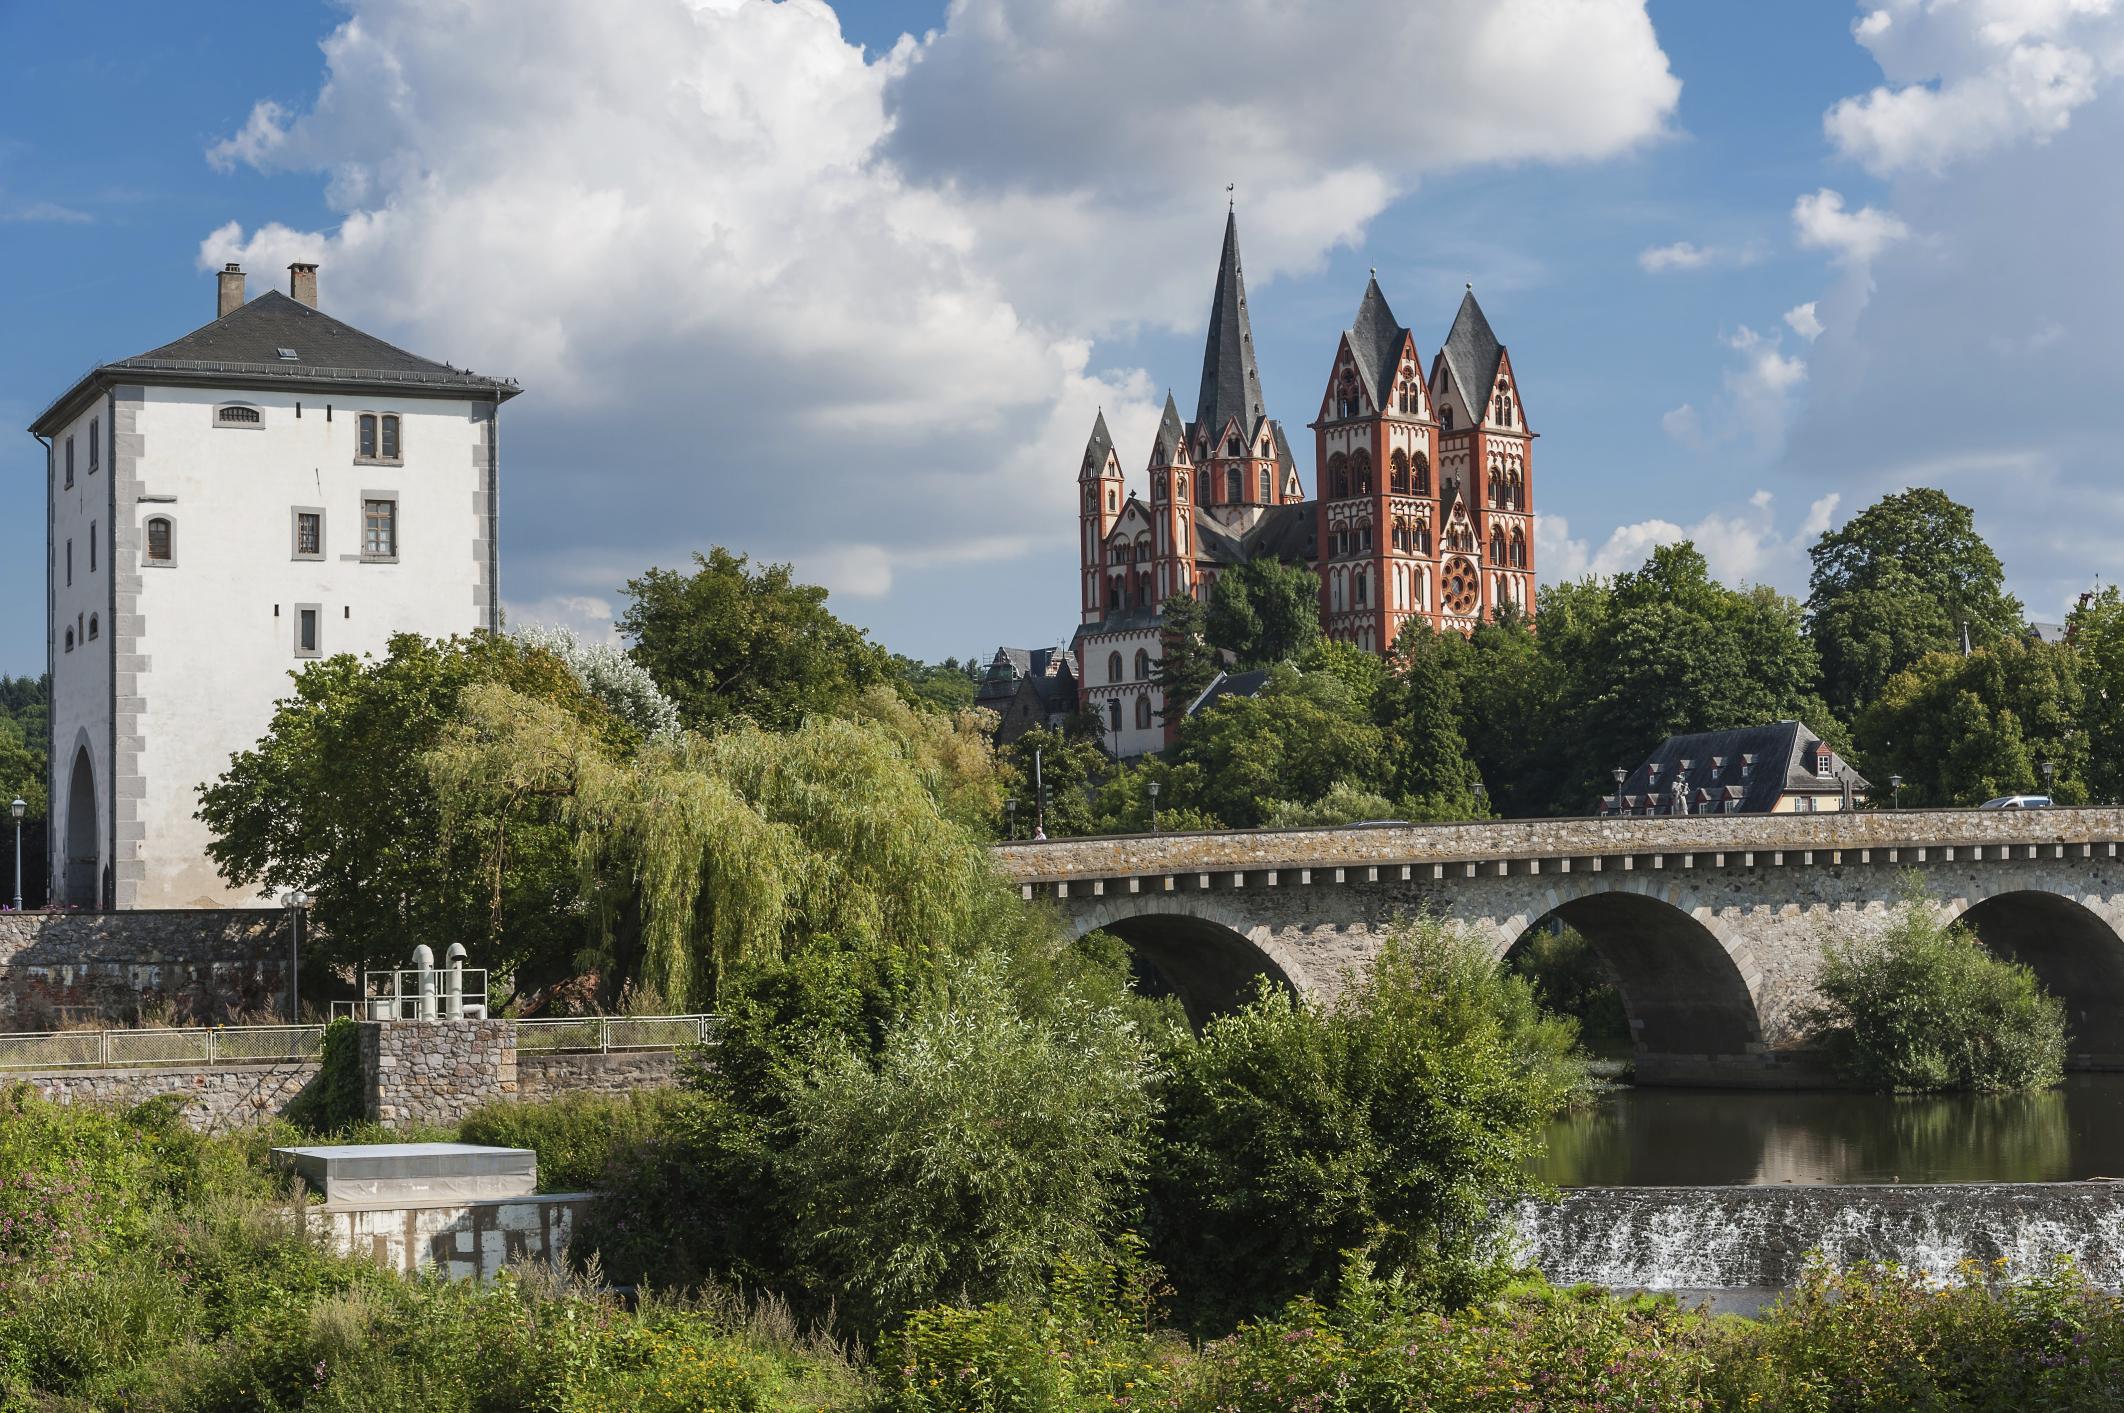 City of Limburg by Train